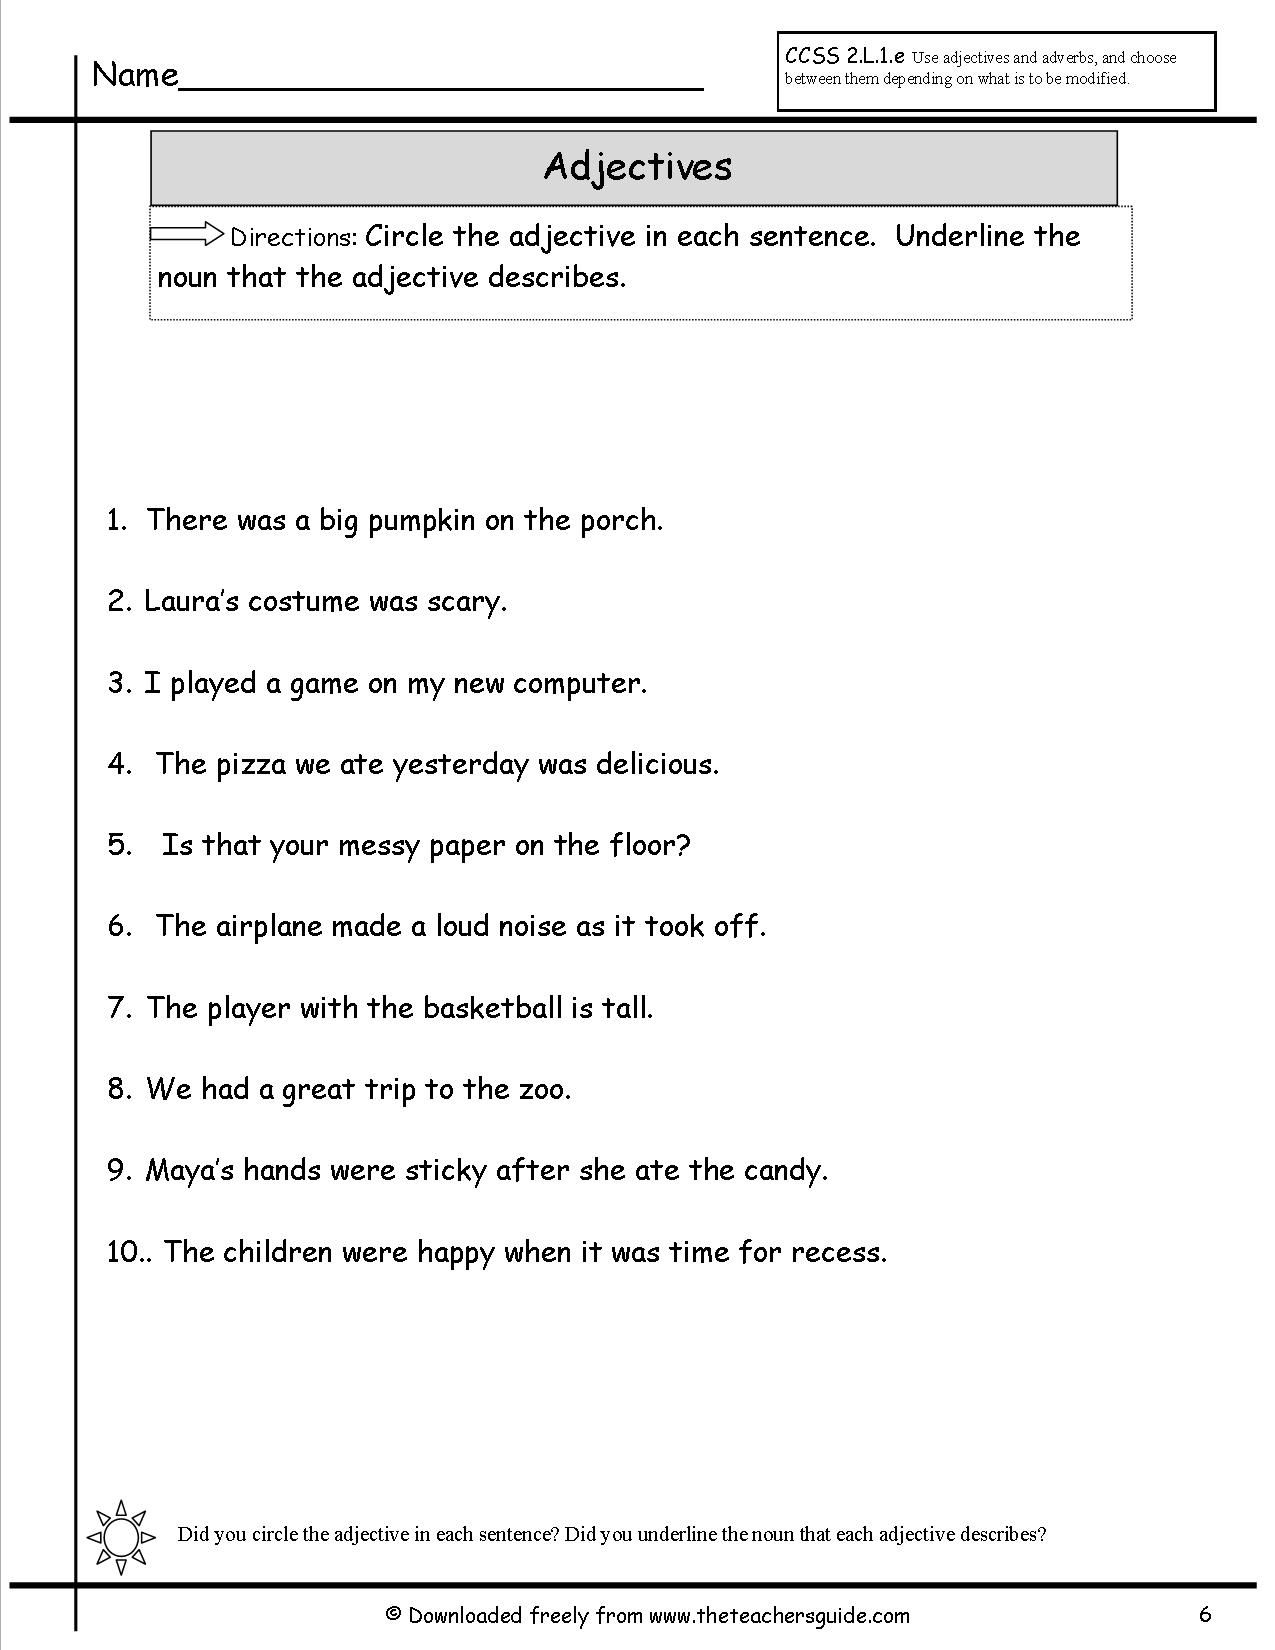 hight resolution of adjectivessix.jpg (1275×1650)   Kindergarten worksheets